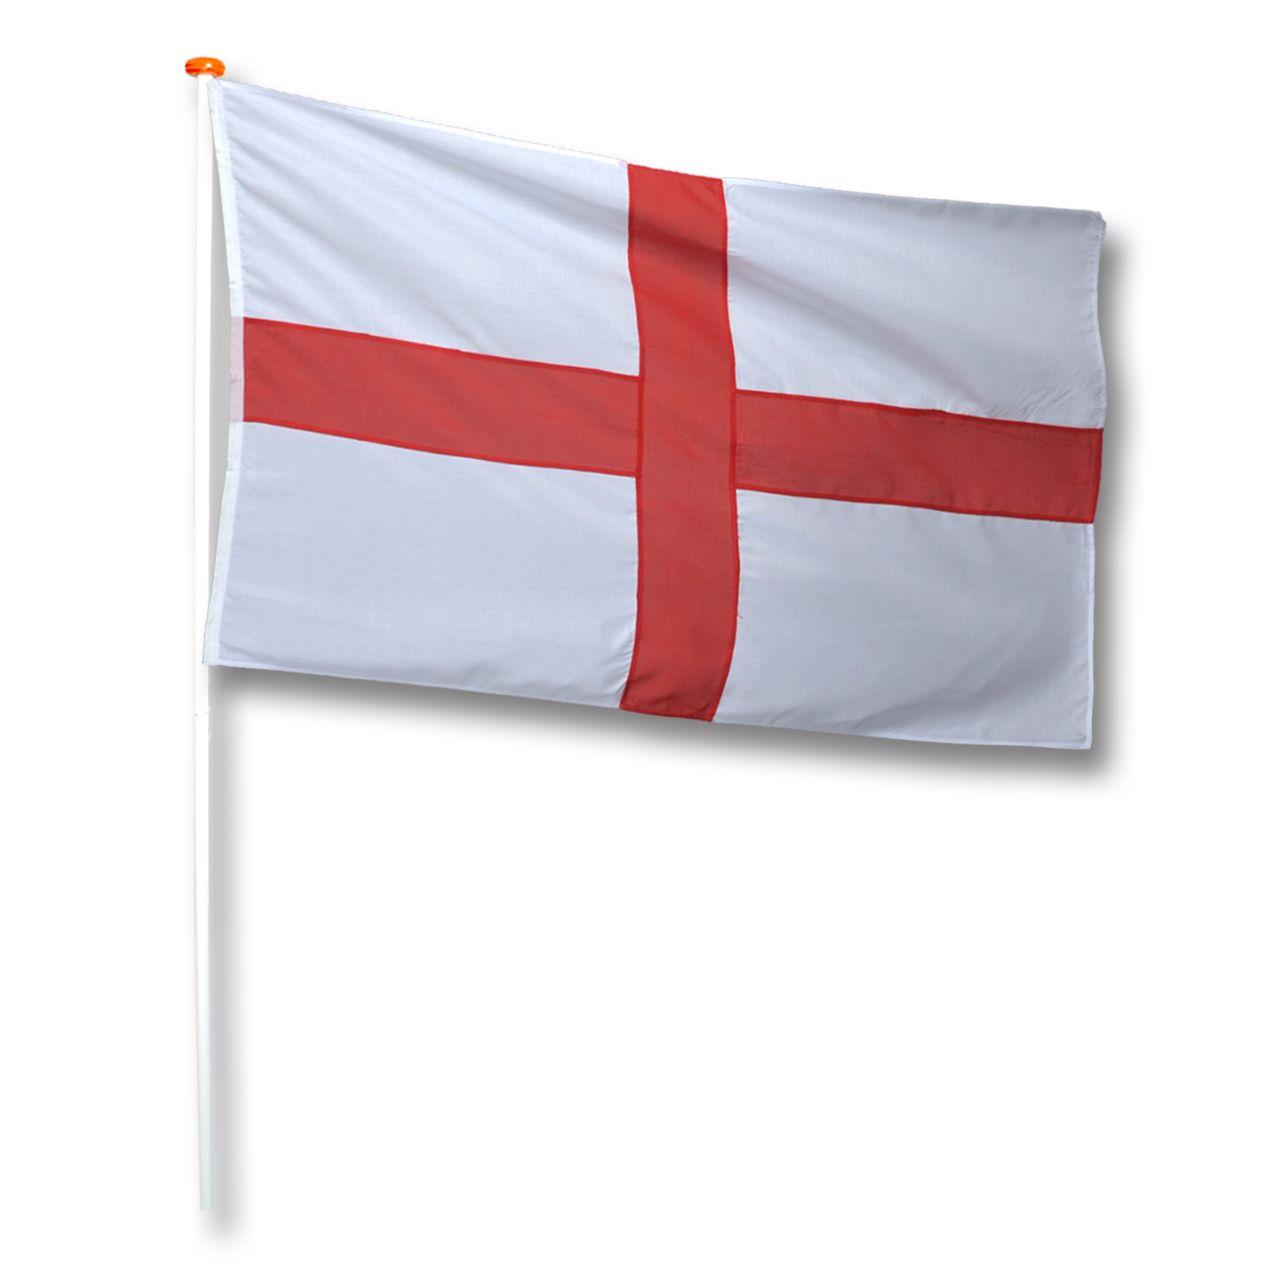 Vlag Engelse vlag (Vlag St. George's Cross)